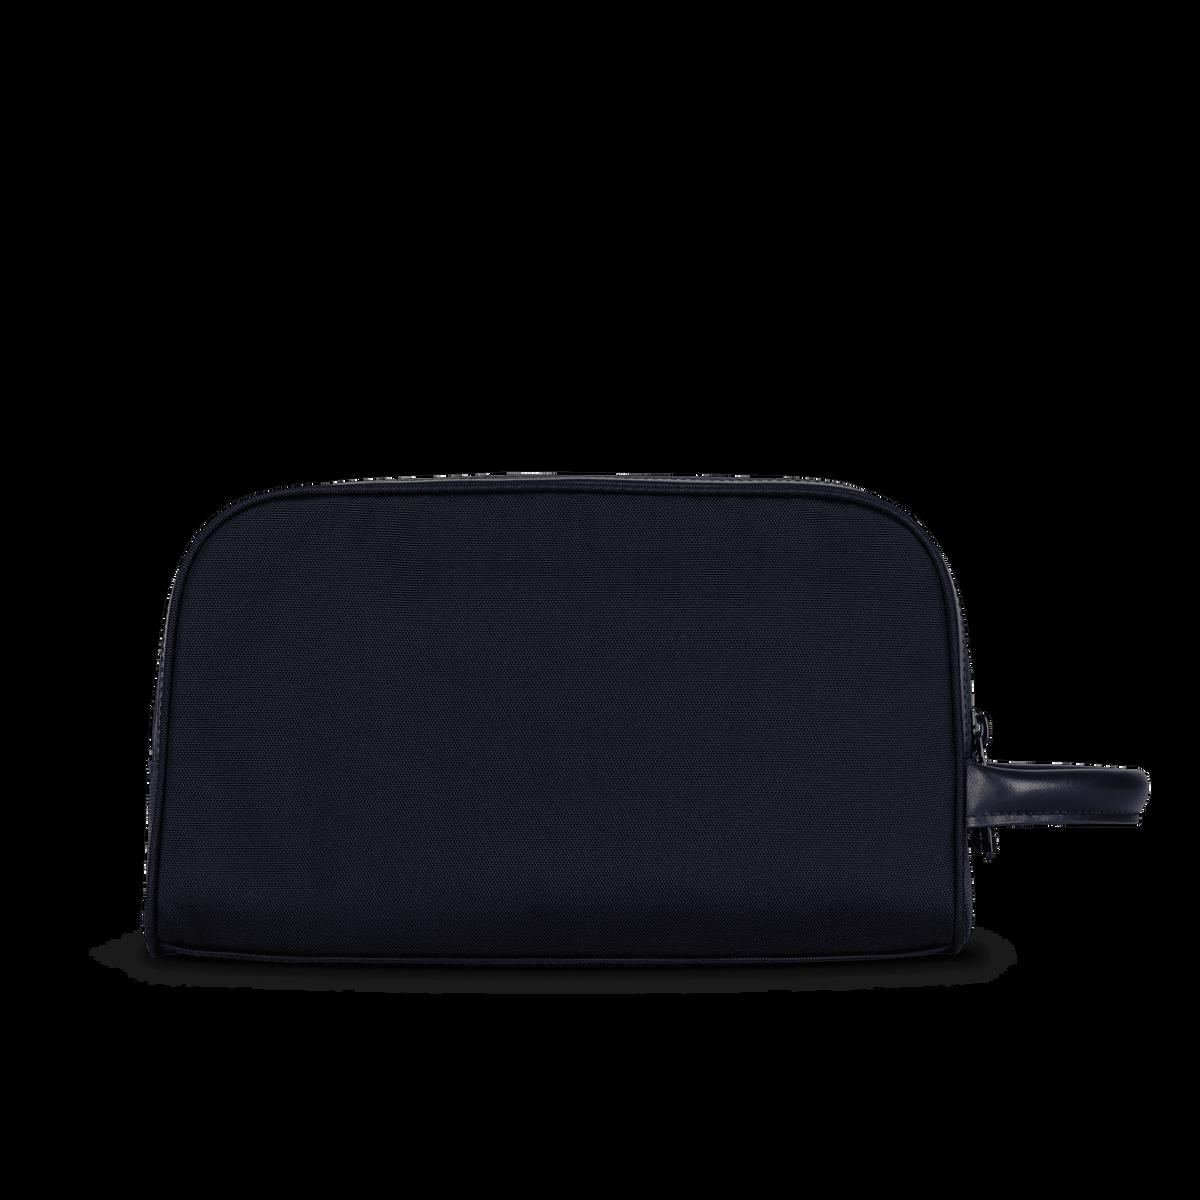 Professional Large Dopp Kit